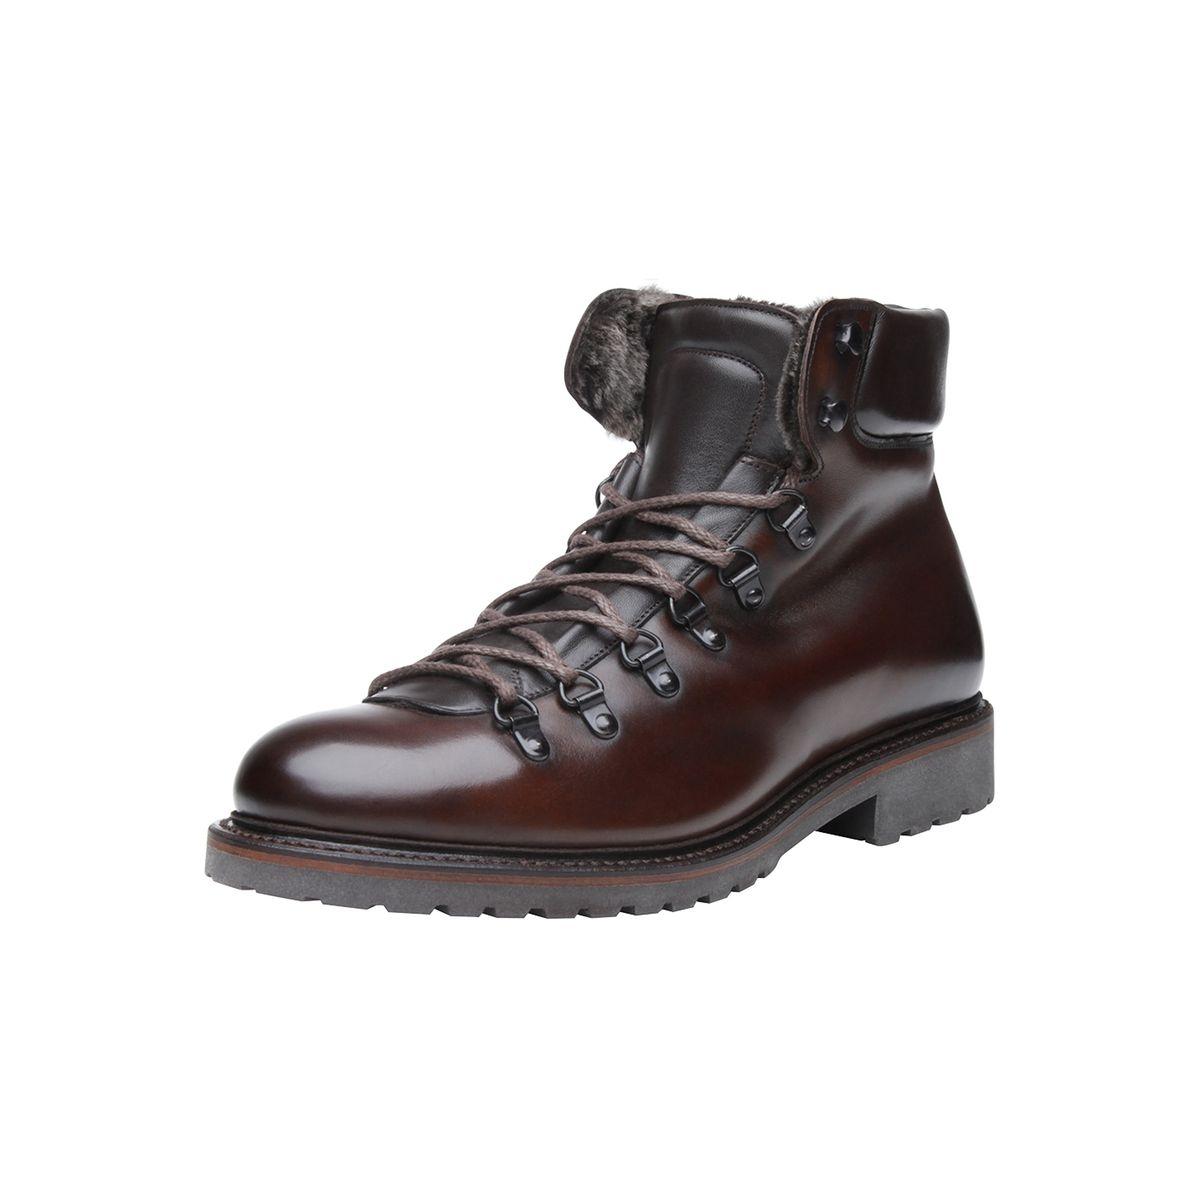 Boots en marron foncé